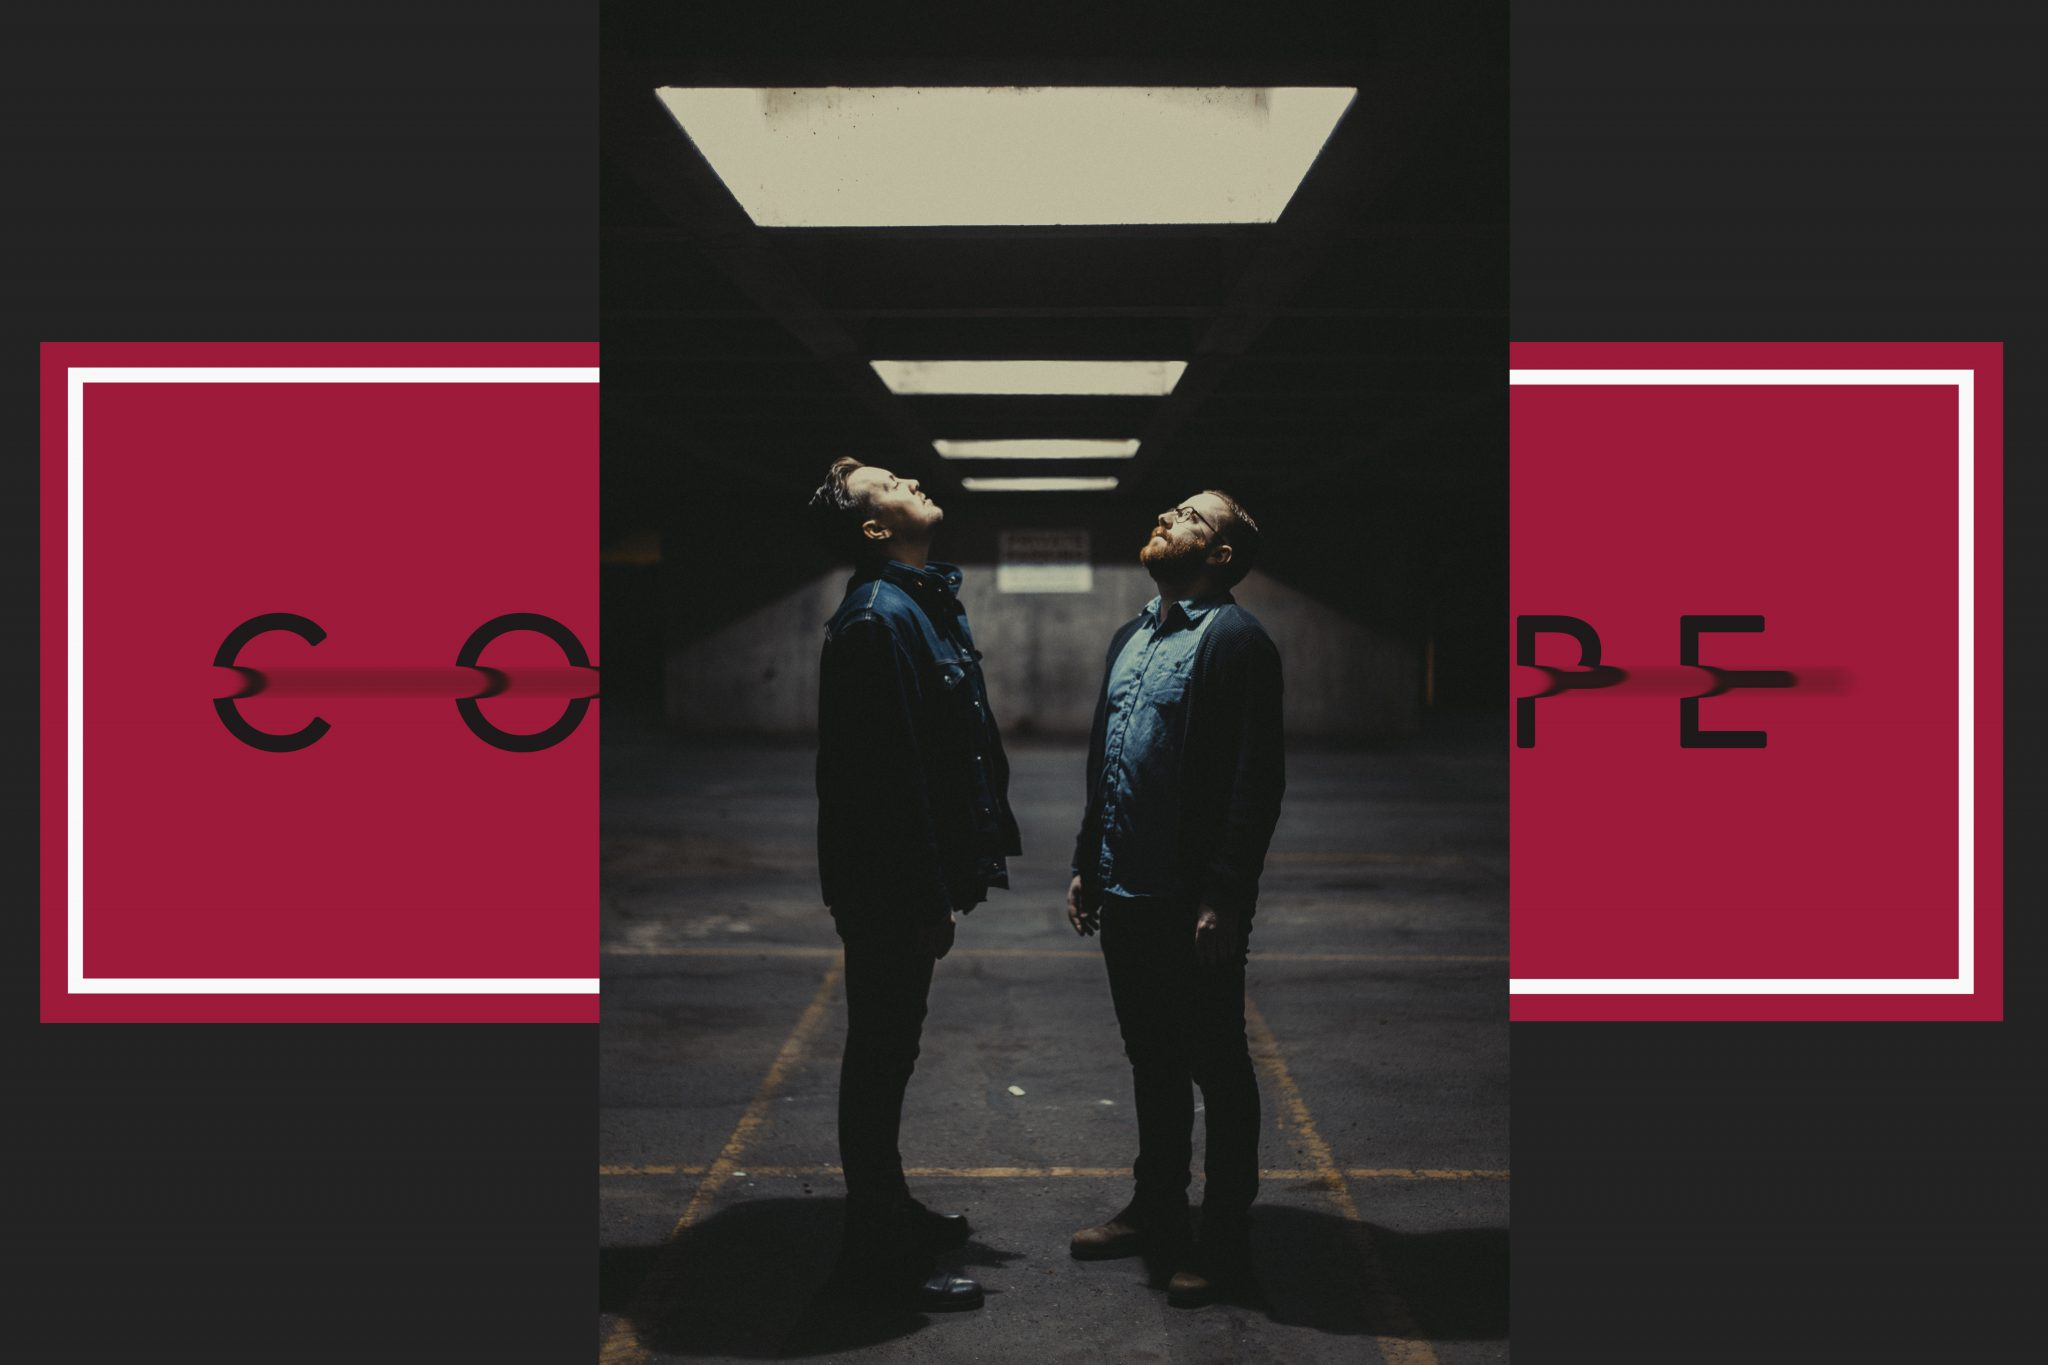 Cope EP